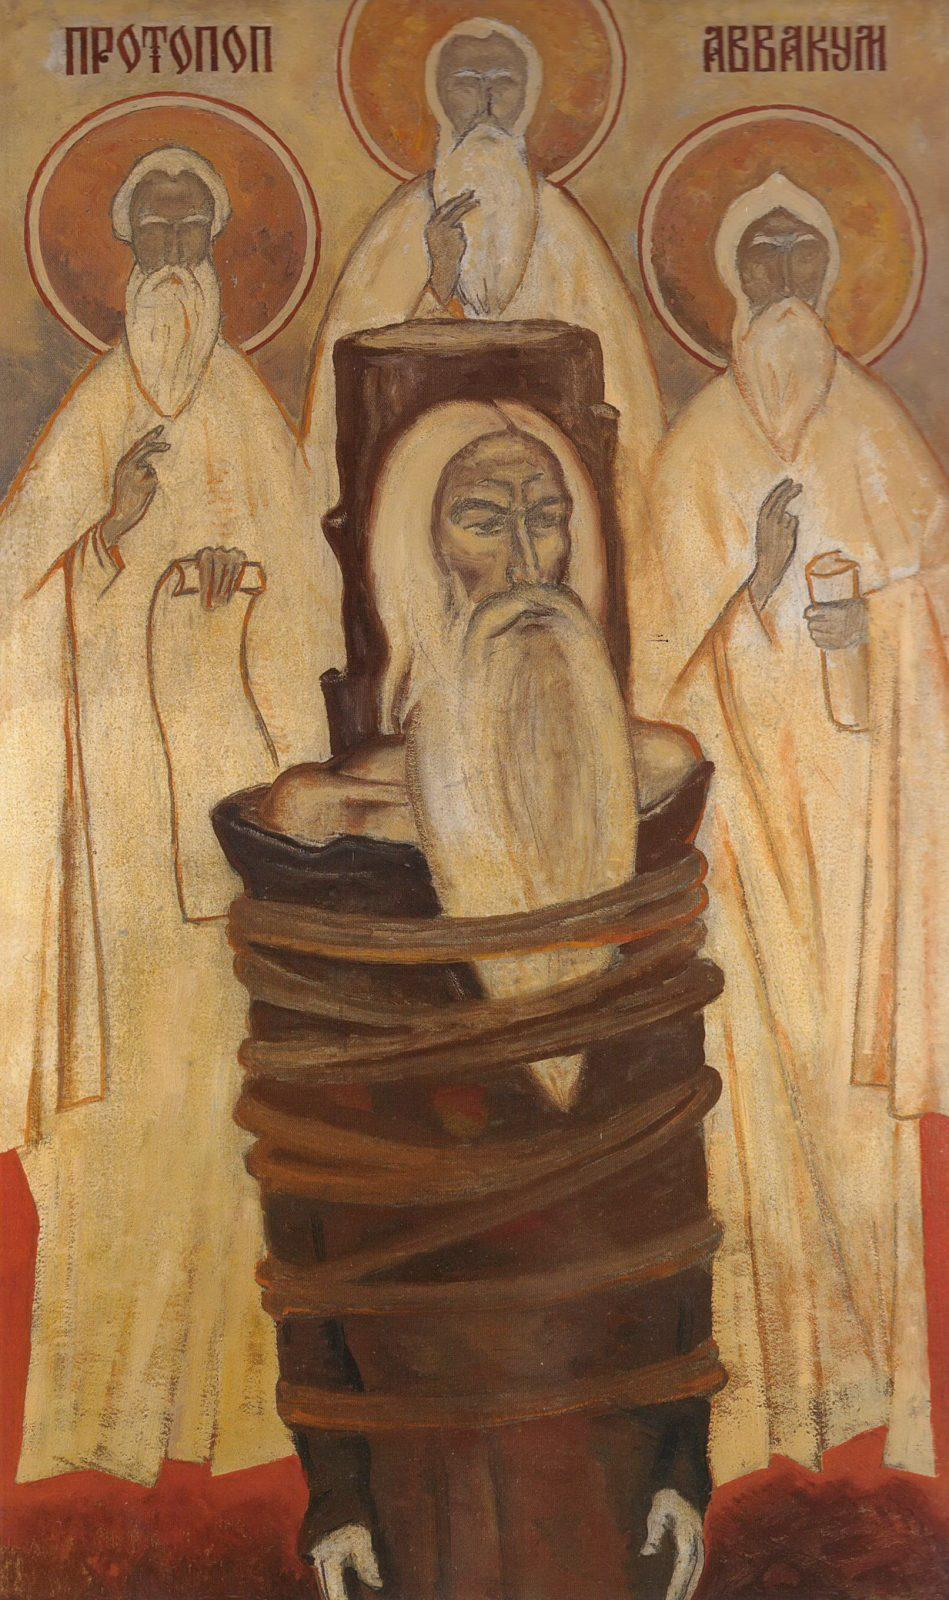 ossovskij (1)